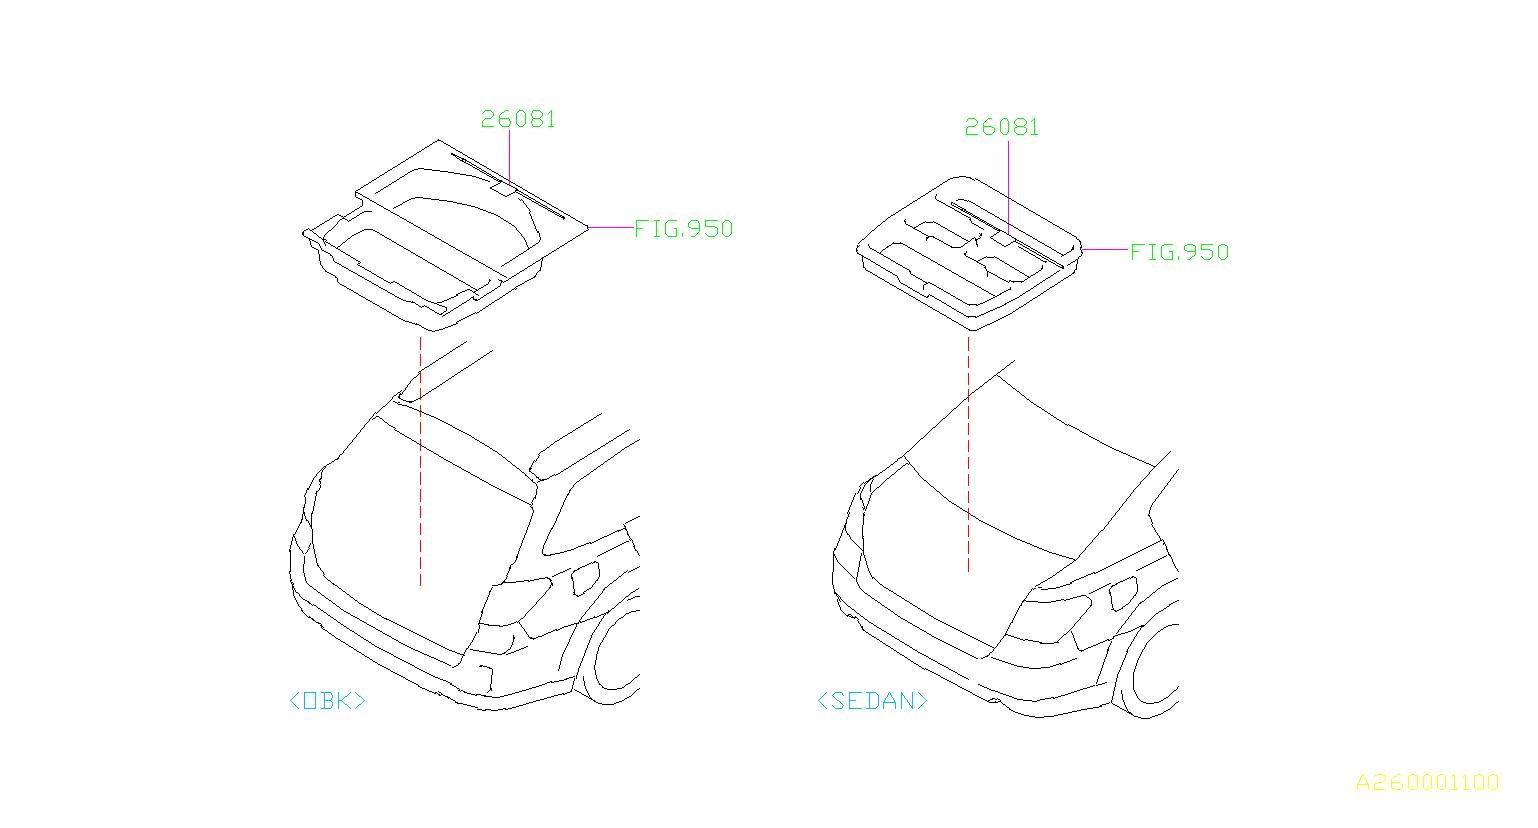 2014 Subaru Outback Tool Electric Parking Brake  Tool Epb  System  Suspension  Brakes